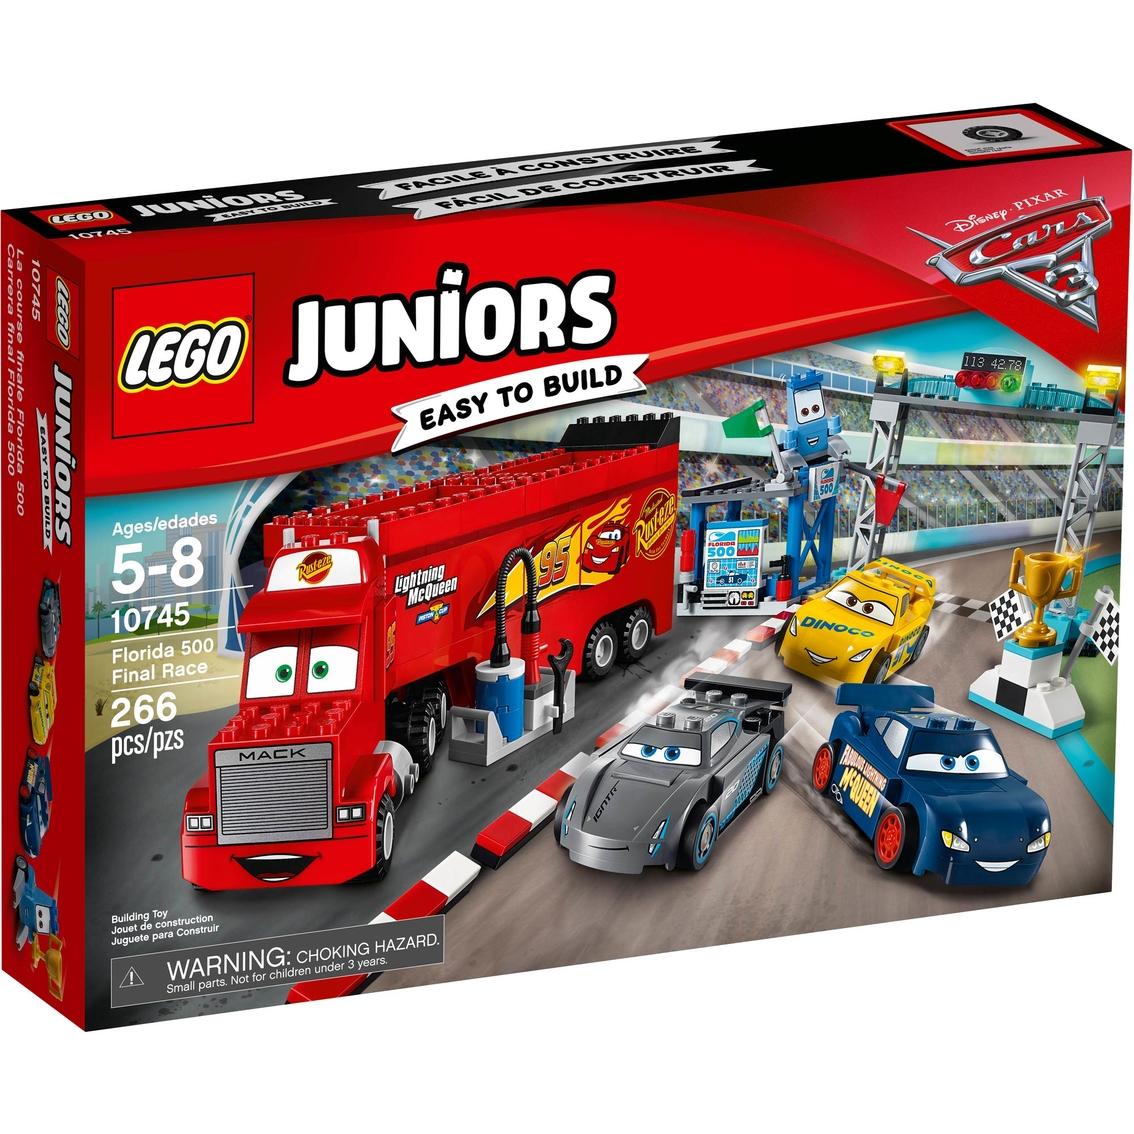 Groovy Lego Juniors Disney Pixar Cars 3 Florida 500 Final Race Evergreenethics Interior Chair Design Evergreenethicsorg